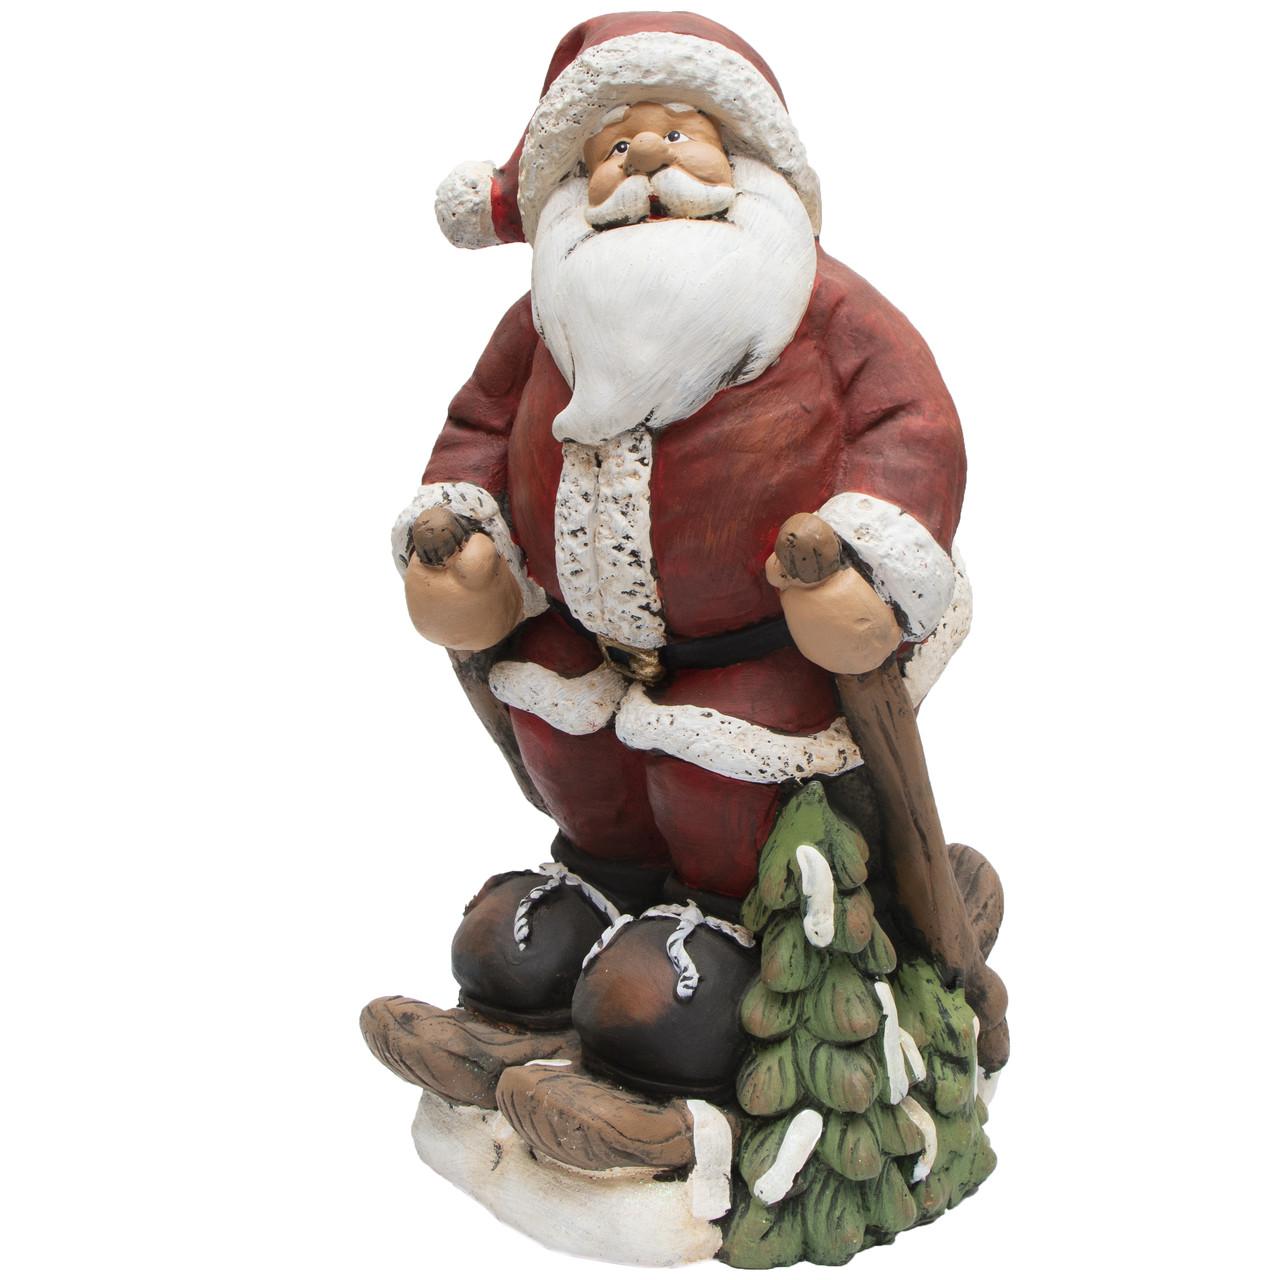 Декоративная фигурка - Дед Мороз, 27*23*46 см, красный с белым, полистоун (441358)